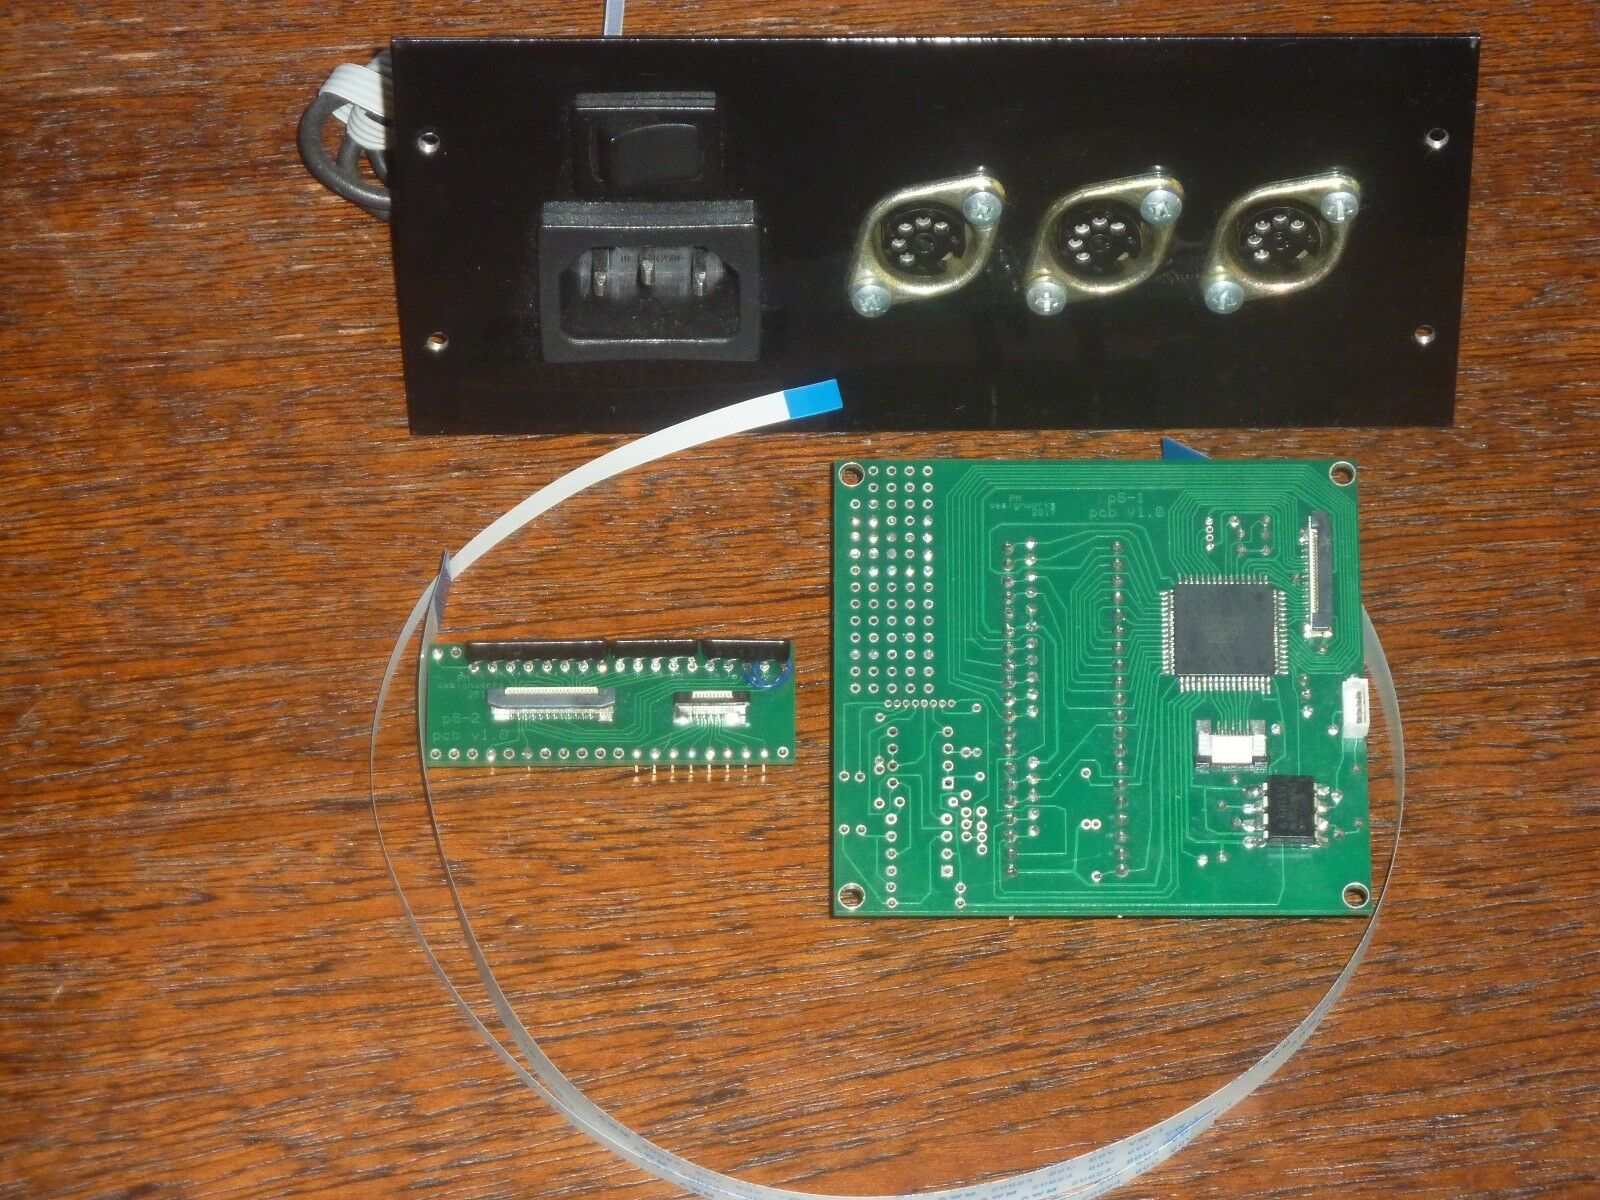 Full midi upgrade for Korg Polysix sinthestorlekr  PolyMix